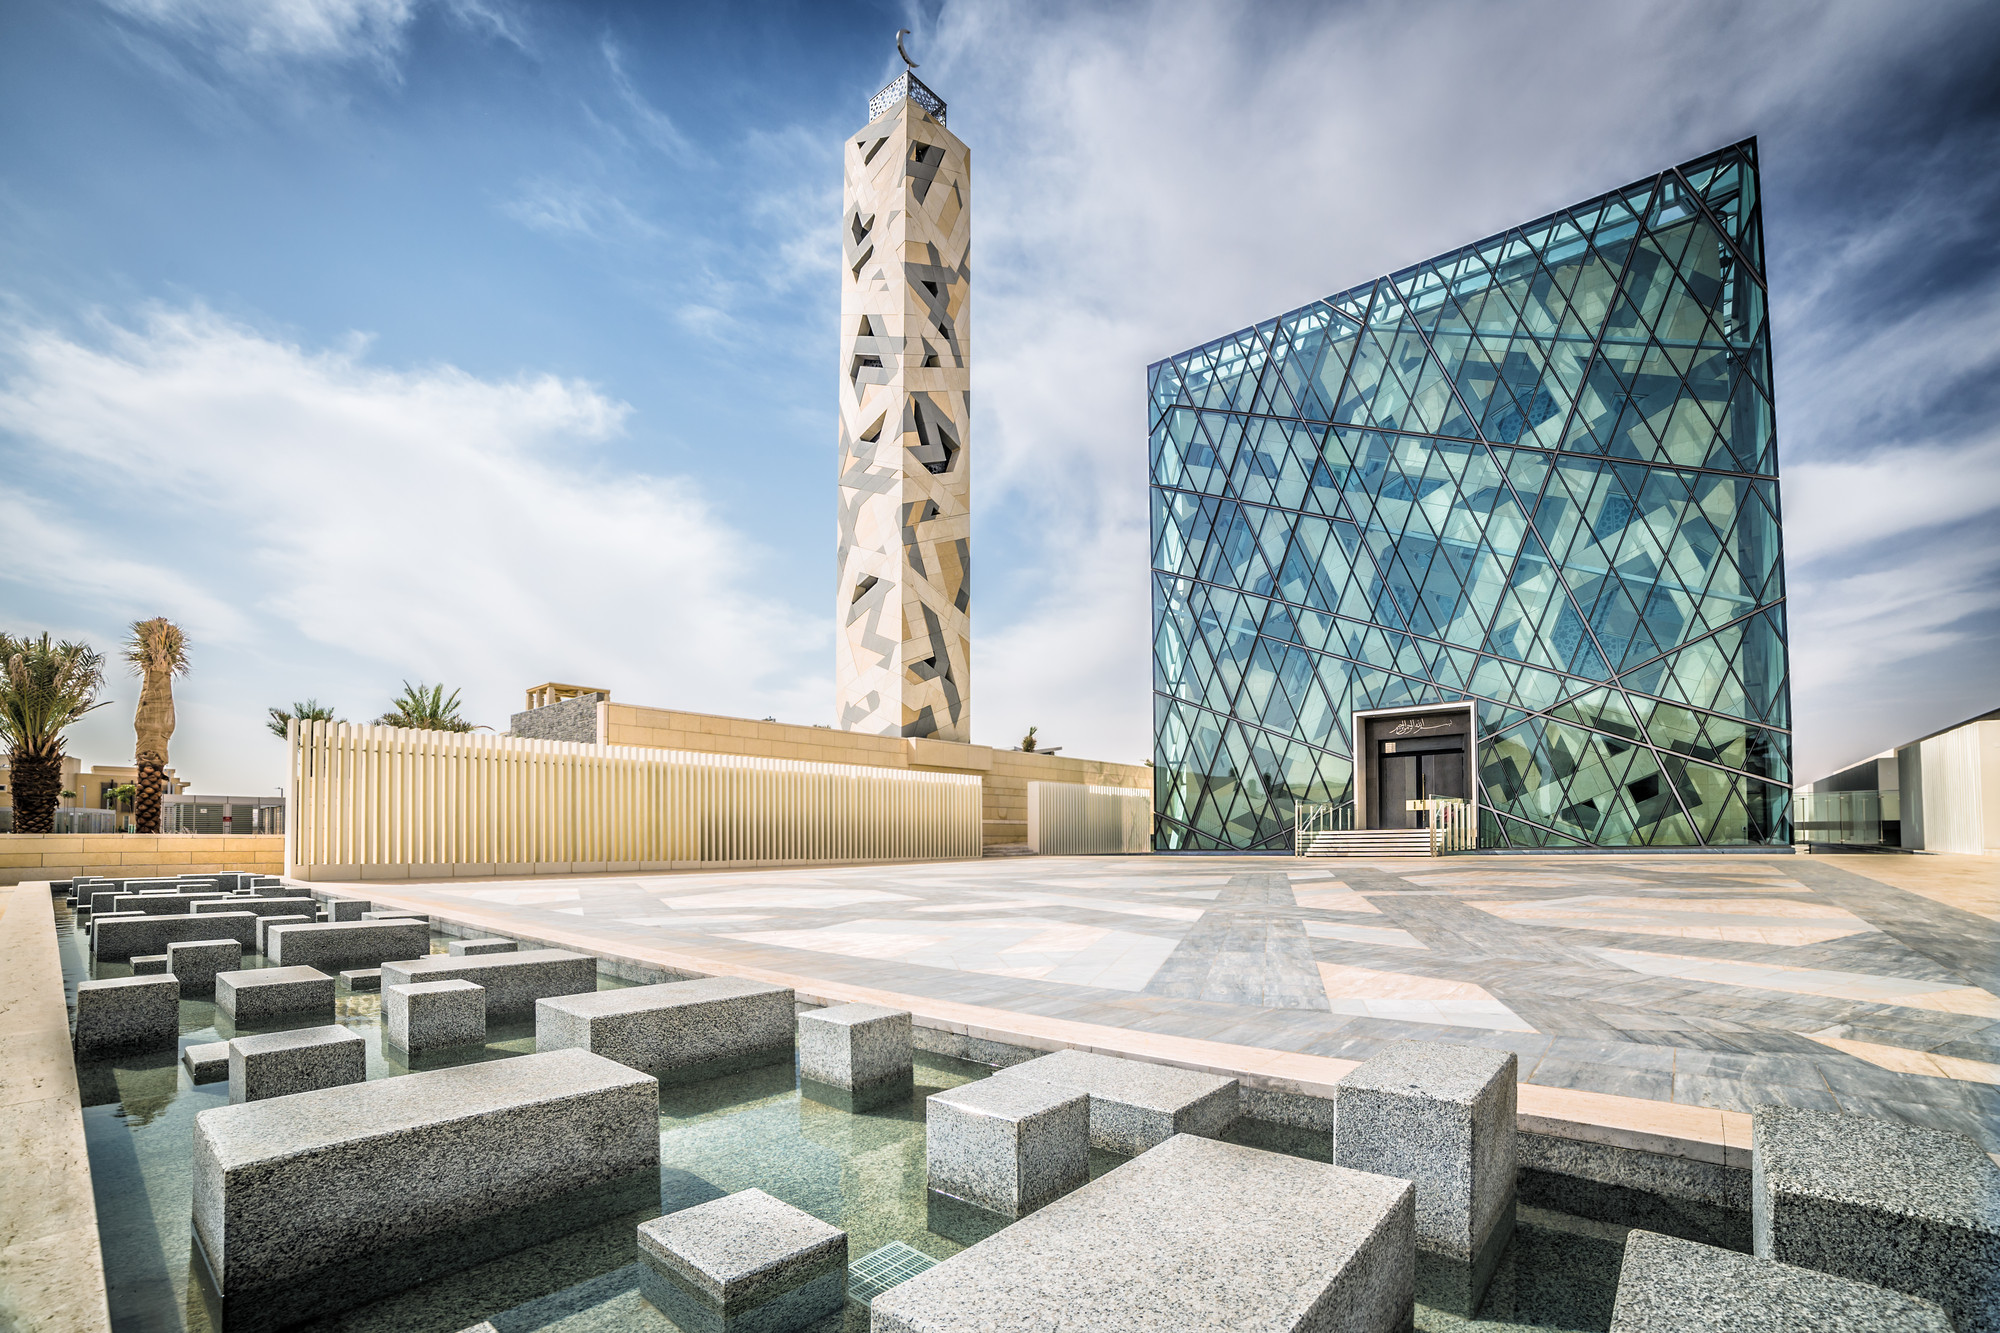 Mesquita KAPSARC / HOK, © Abdulrahman Alolyan